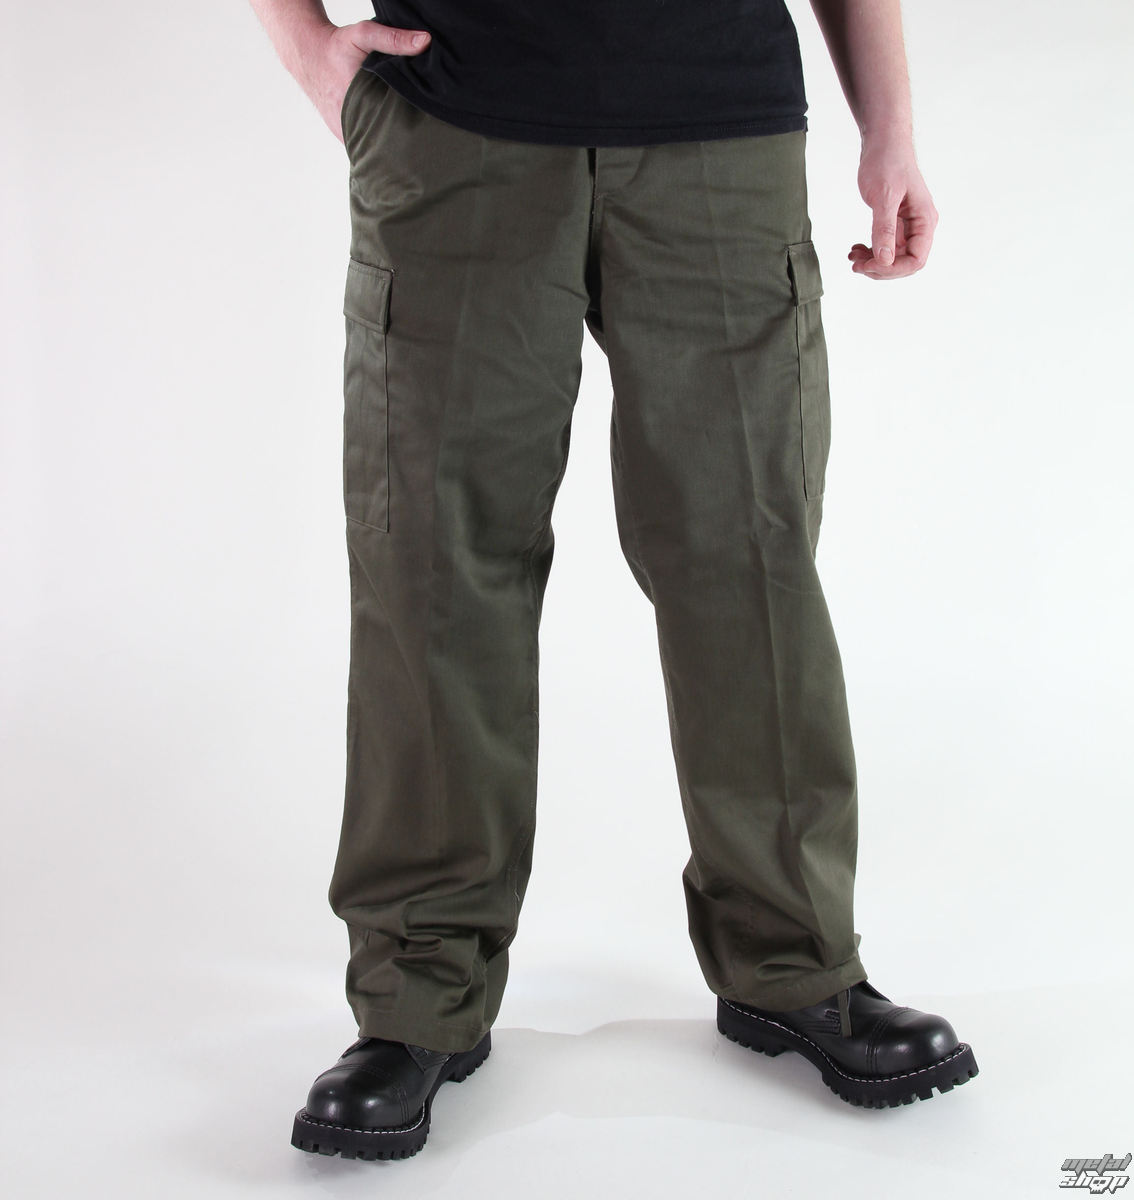 nohavice pánske MIL-TEC - US Ranger Hose - Oliv - 11810001